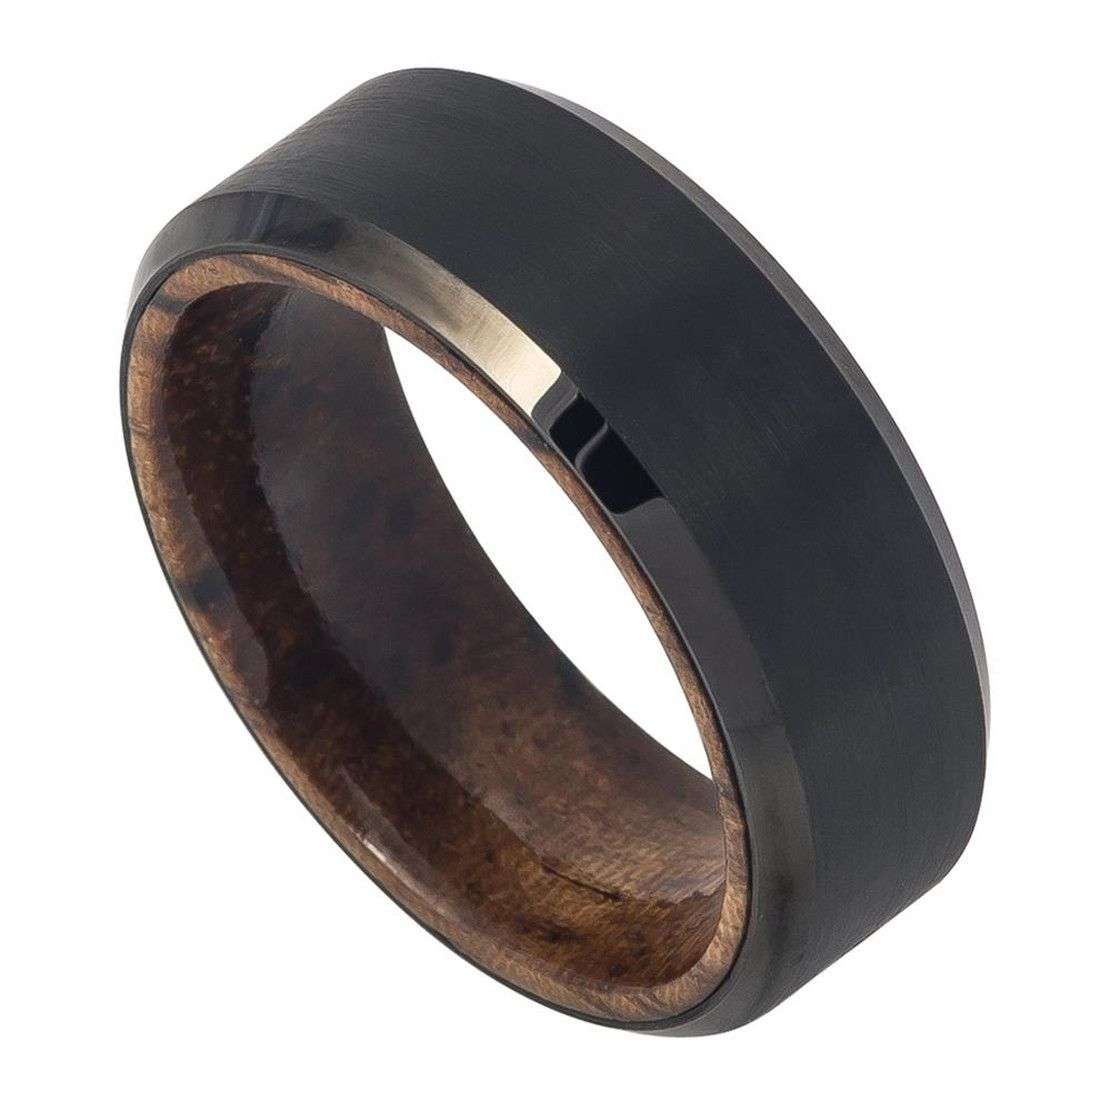 ring 8mm men tungsten wedding - Mens Tungsten Wedding Rings